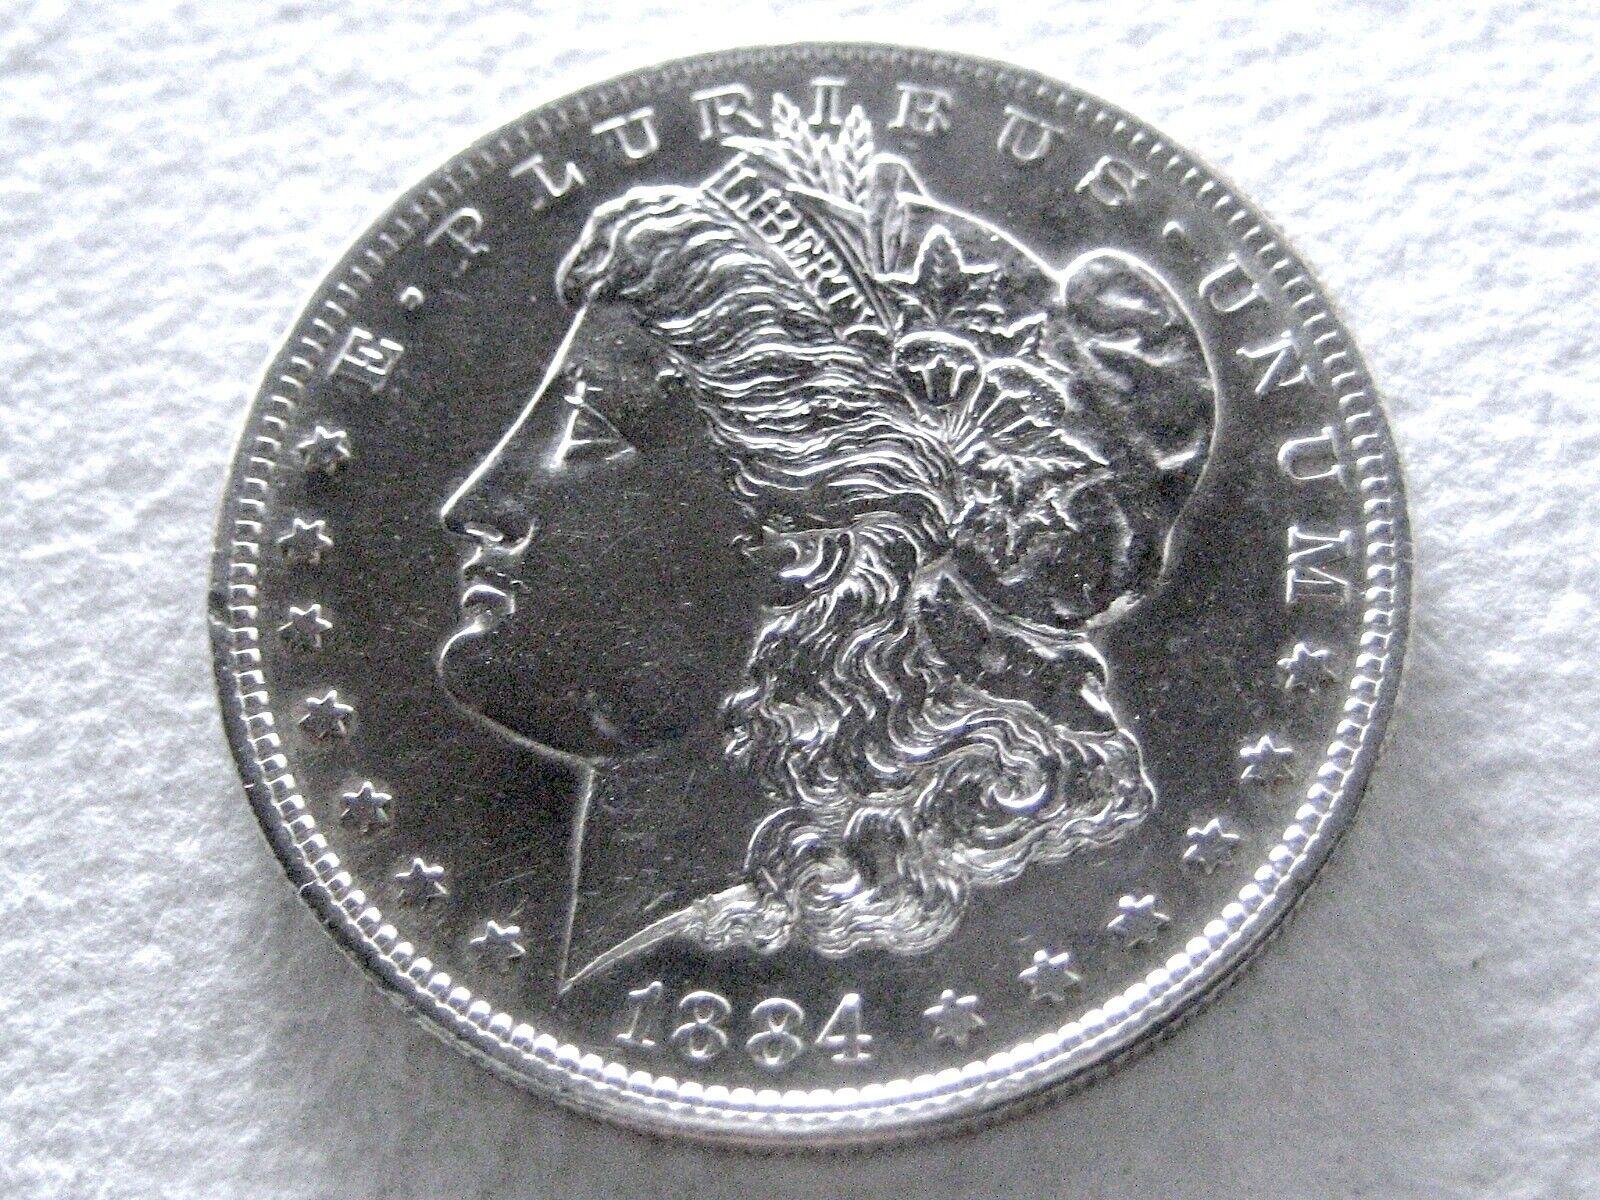 1884-S Morgan Dollar, Reflective PL Mirrors Extreme Detail 21-Y  - $595.00